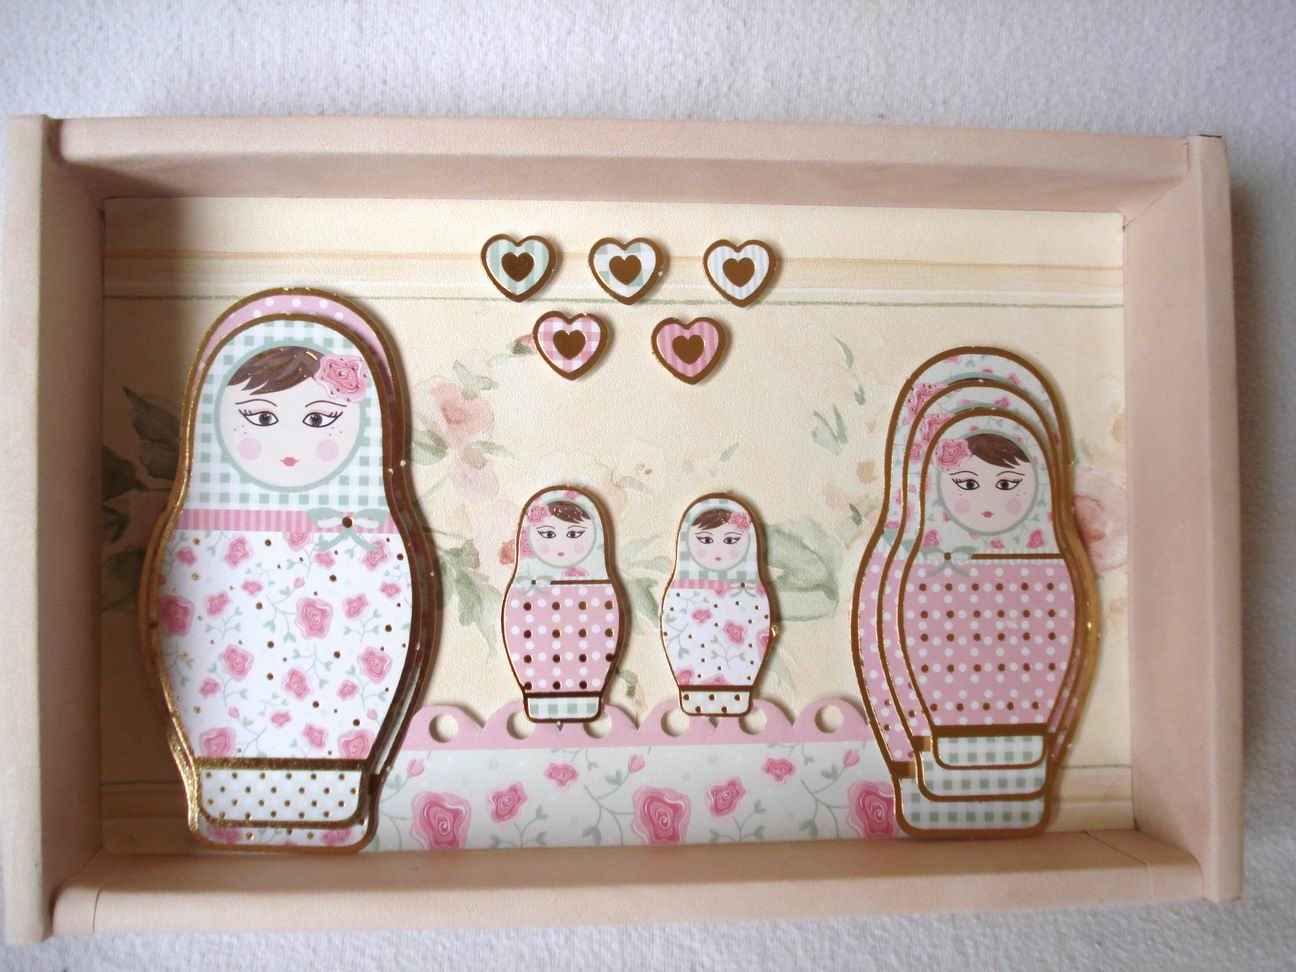 3d bild mit matroschkas babuschkas handmade kultur - 3d bilder basteln ...